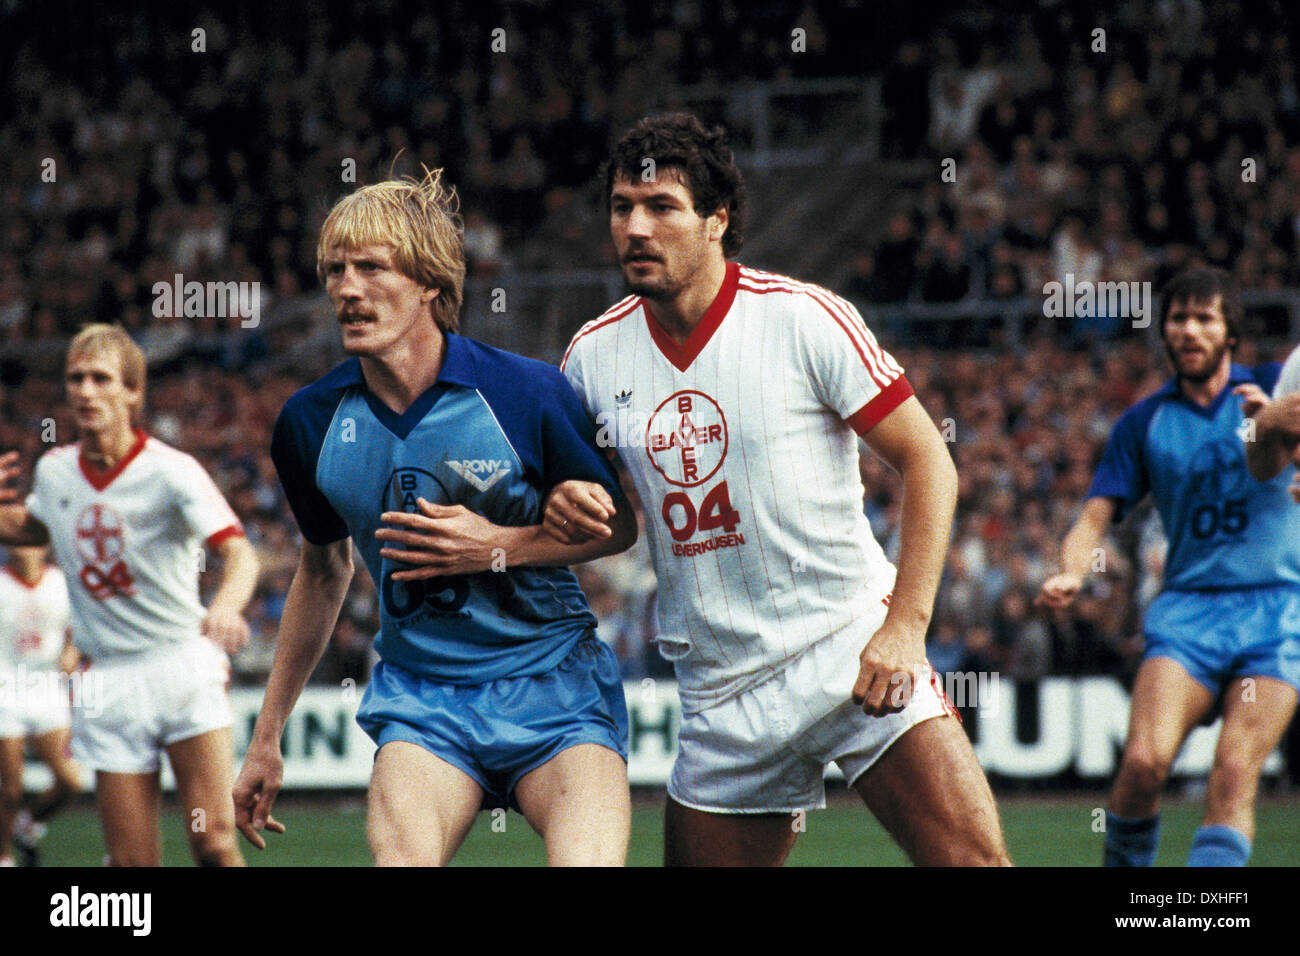 football, Bundesliga, 1983/1984, Grotenburg Stadium, FC Bayer 05 Uerdingen versus Bayer 04 Leverkusen 2:1, scene of the match, Peter Loontiens (Uerdingen) left and Walter Posner (Leverkusen) - Stock Image